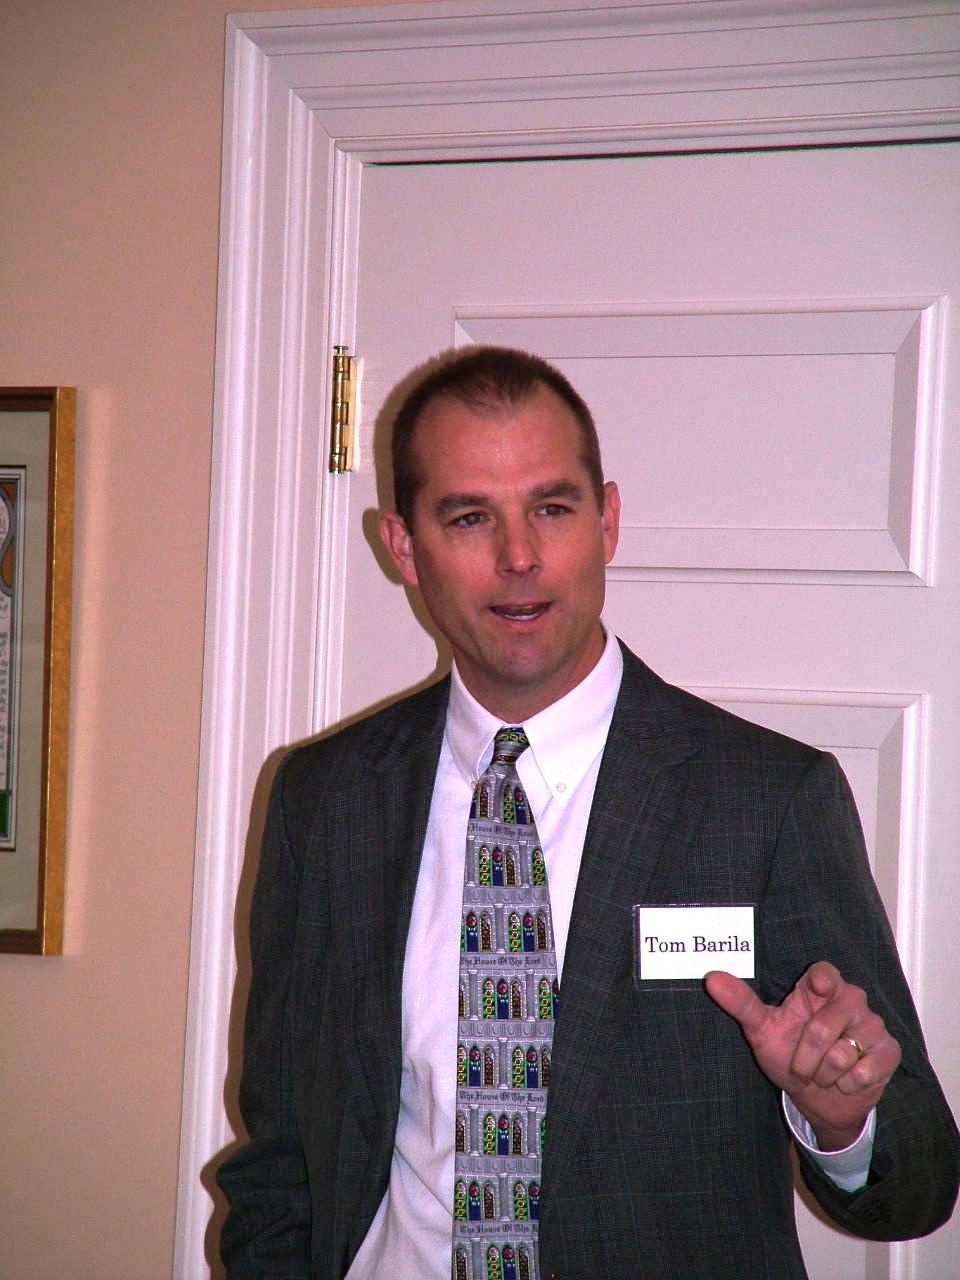 Tom Barila Director of Discipleship and Christian Education